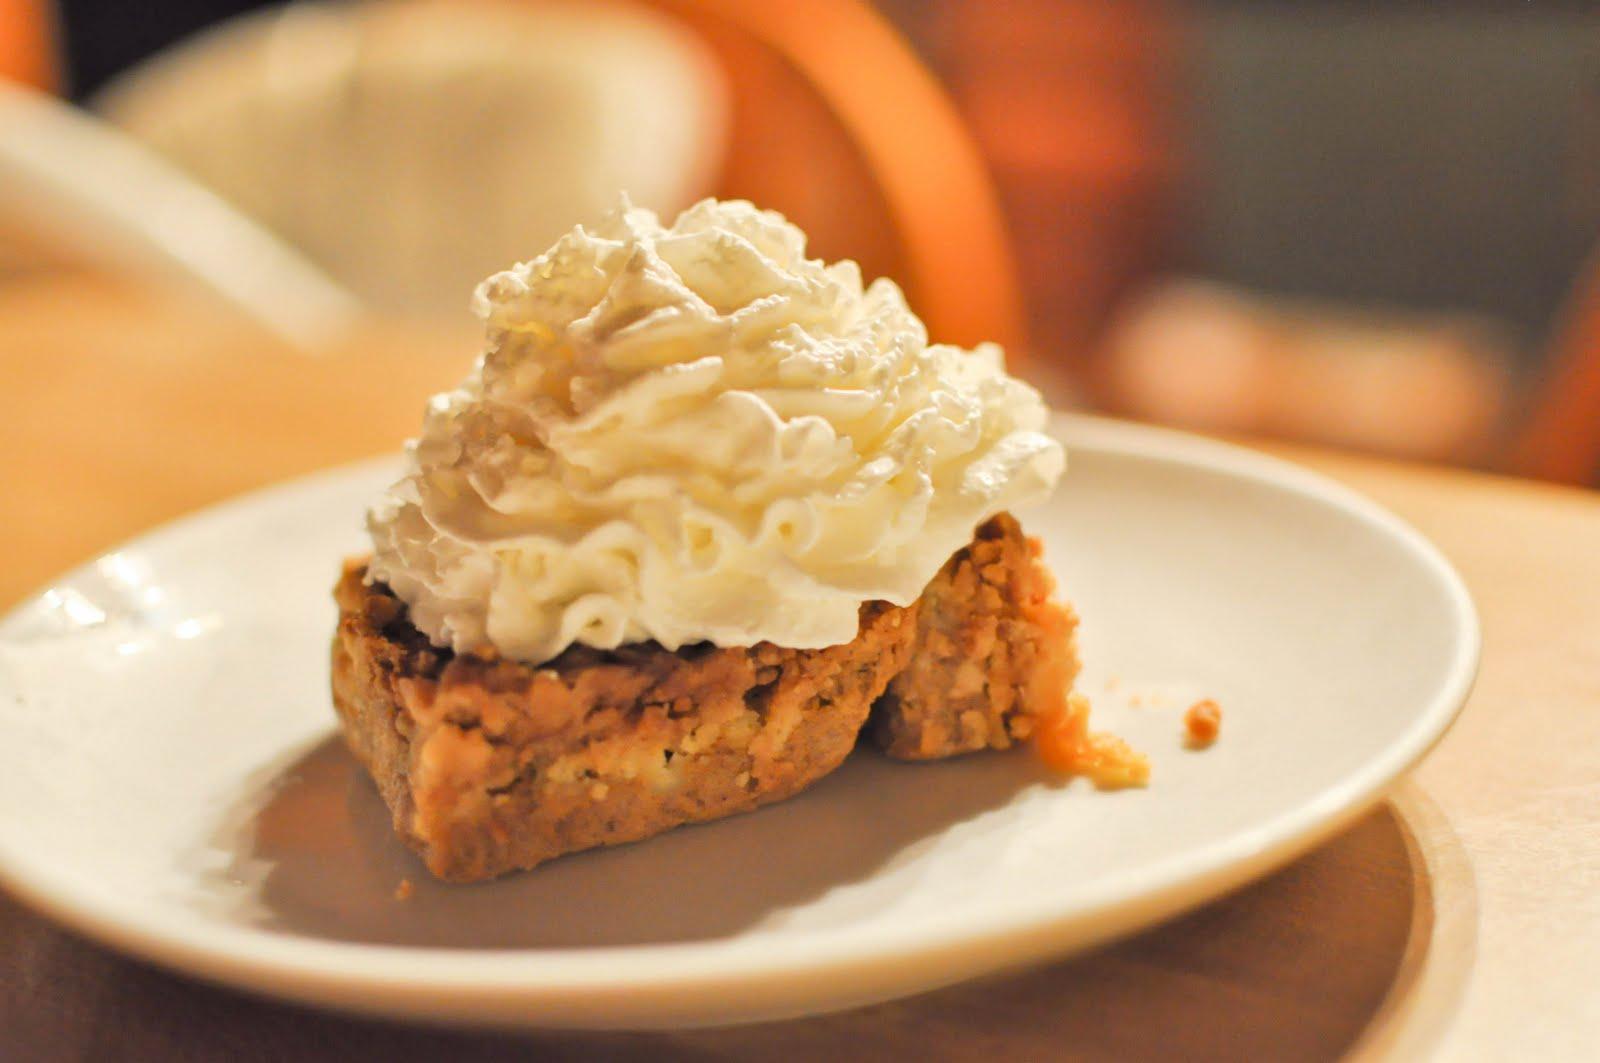 Bless This Food: The Great Pumpkin Dessert